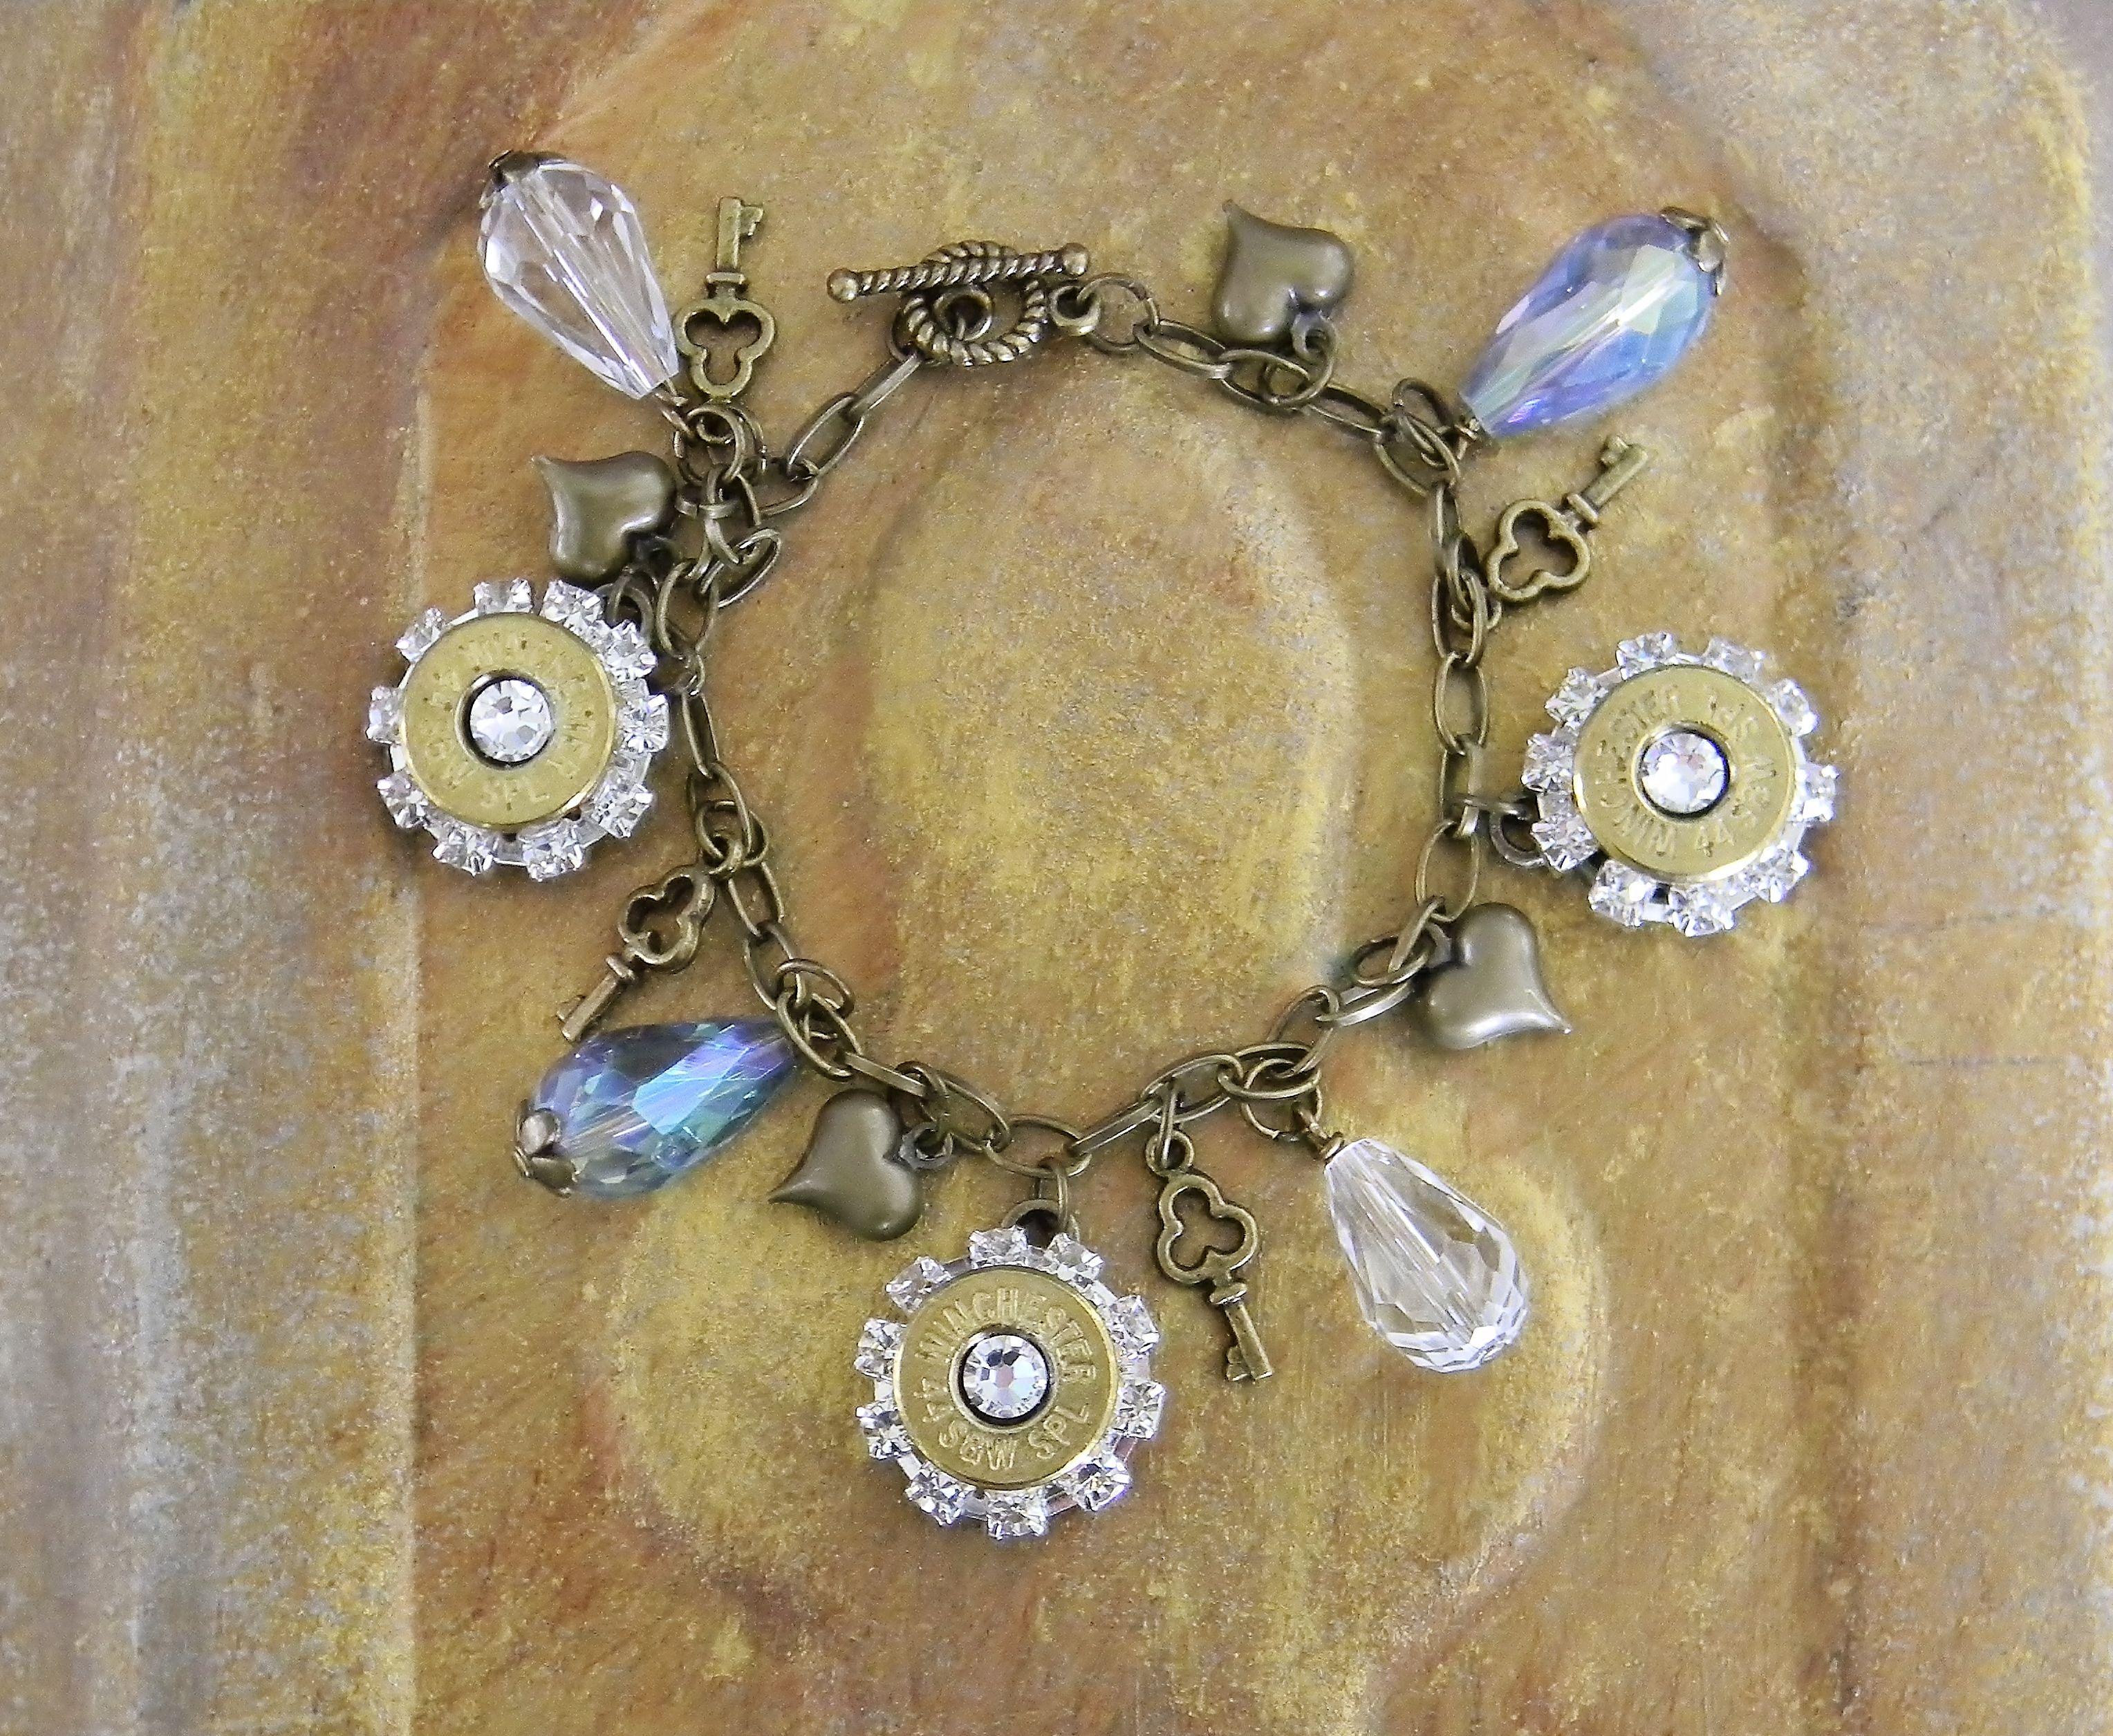 Free body piercing by glock  Bullet JewelryWomenus Bullet Charm Bracelet Use coupon code